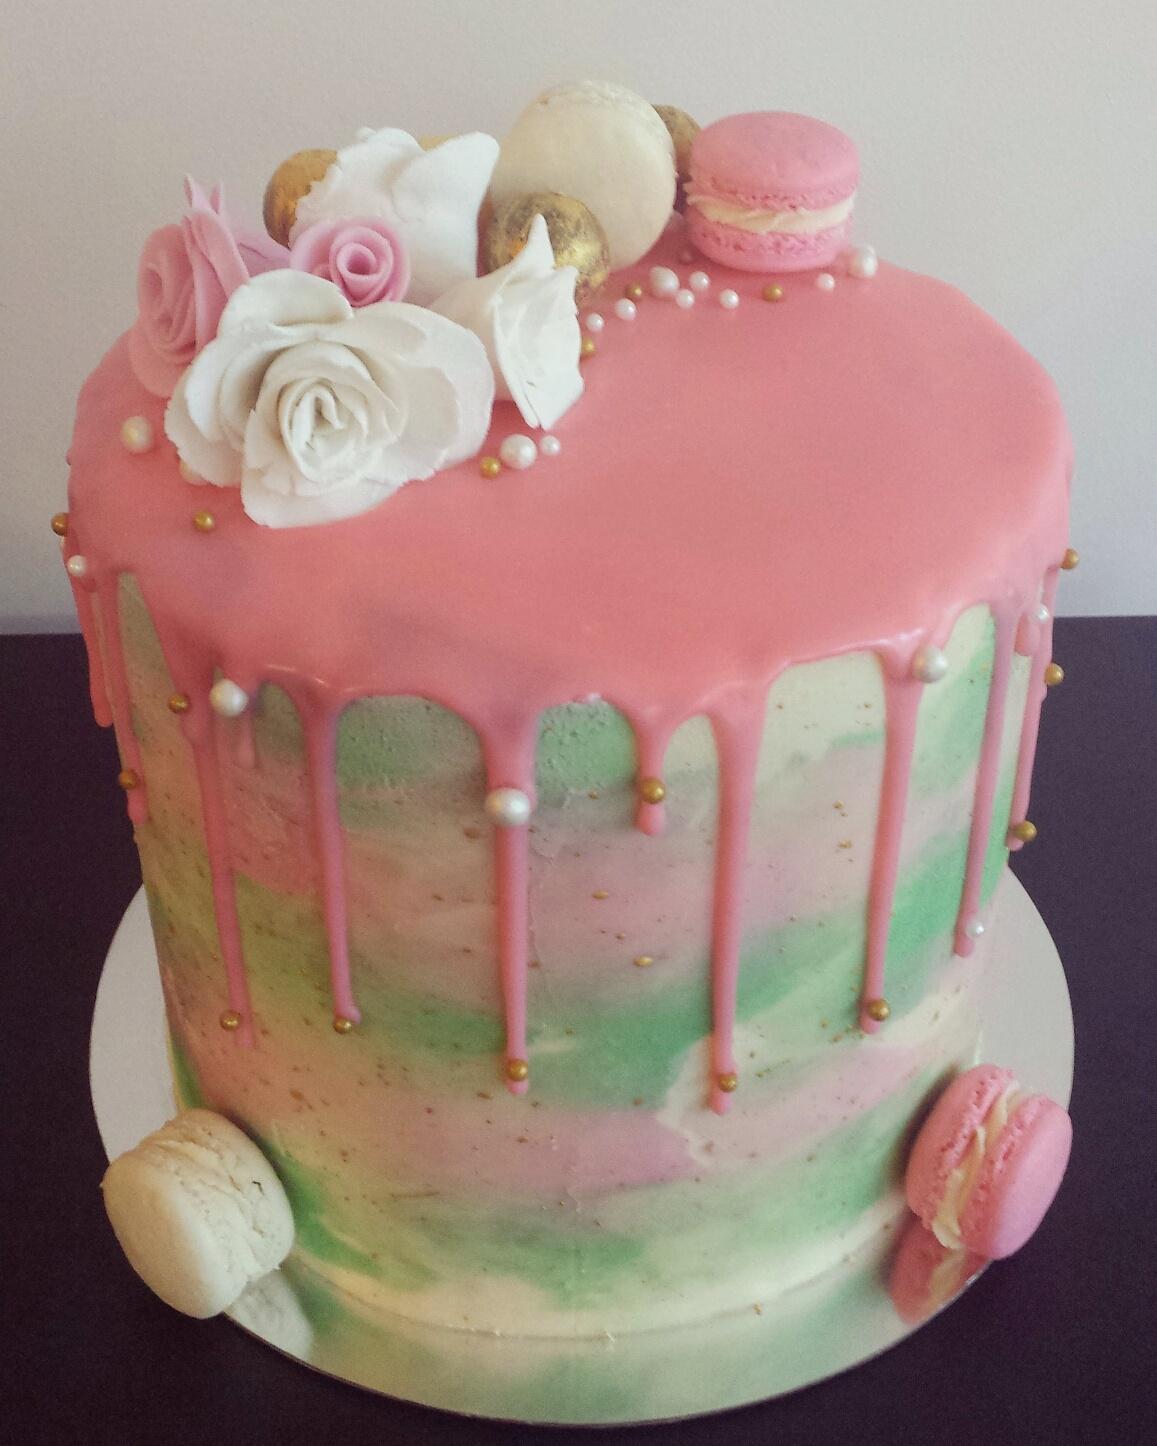 Blog Page 5 Anita Of Cake Red Velvet Nougat 15cm Scrape 1